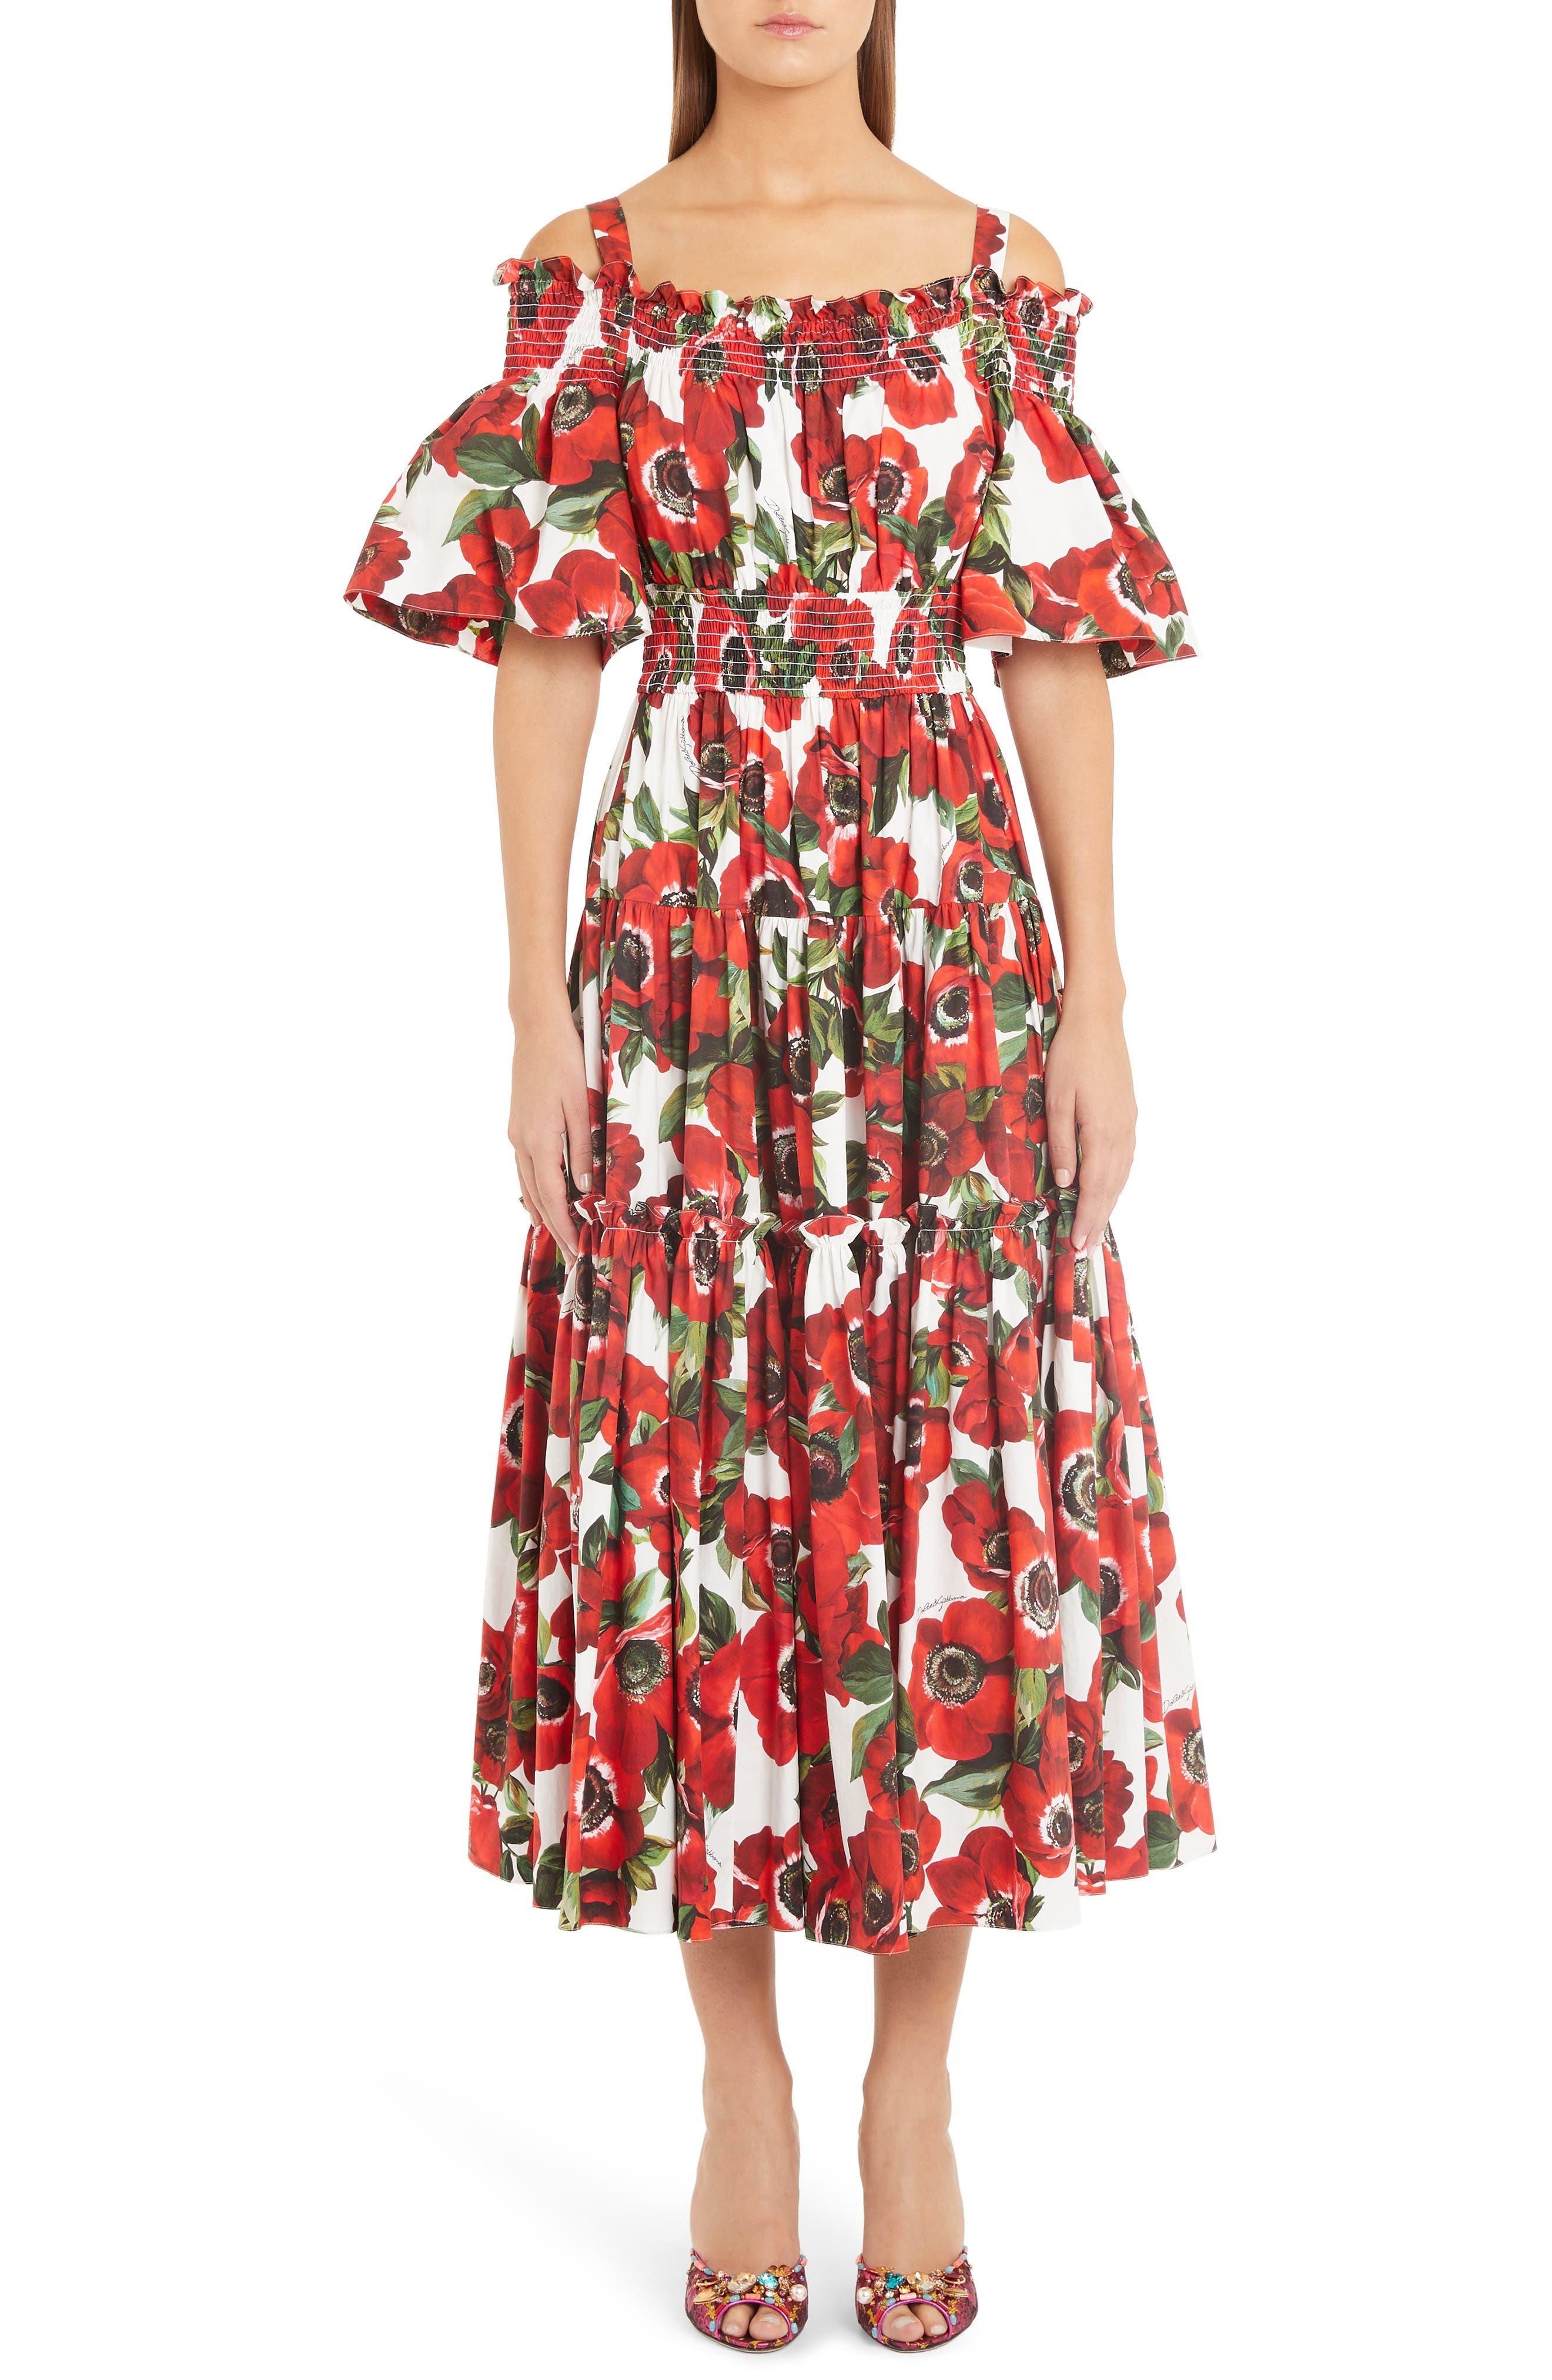 Dolce & gabbana Poppy Print Tiered Cotton Poplin A-Line Dress, US / 44 IT - Red